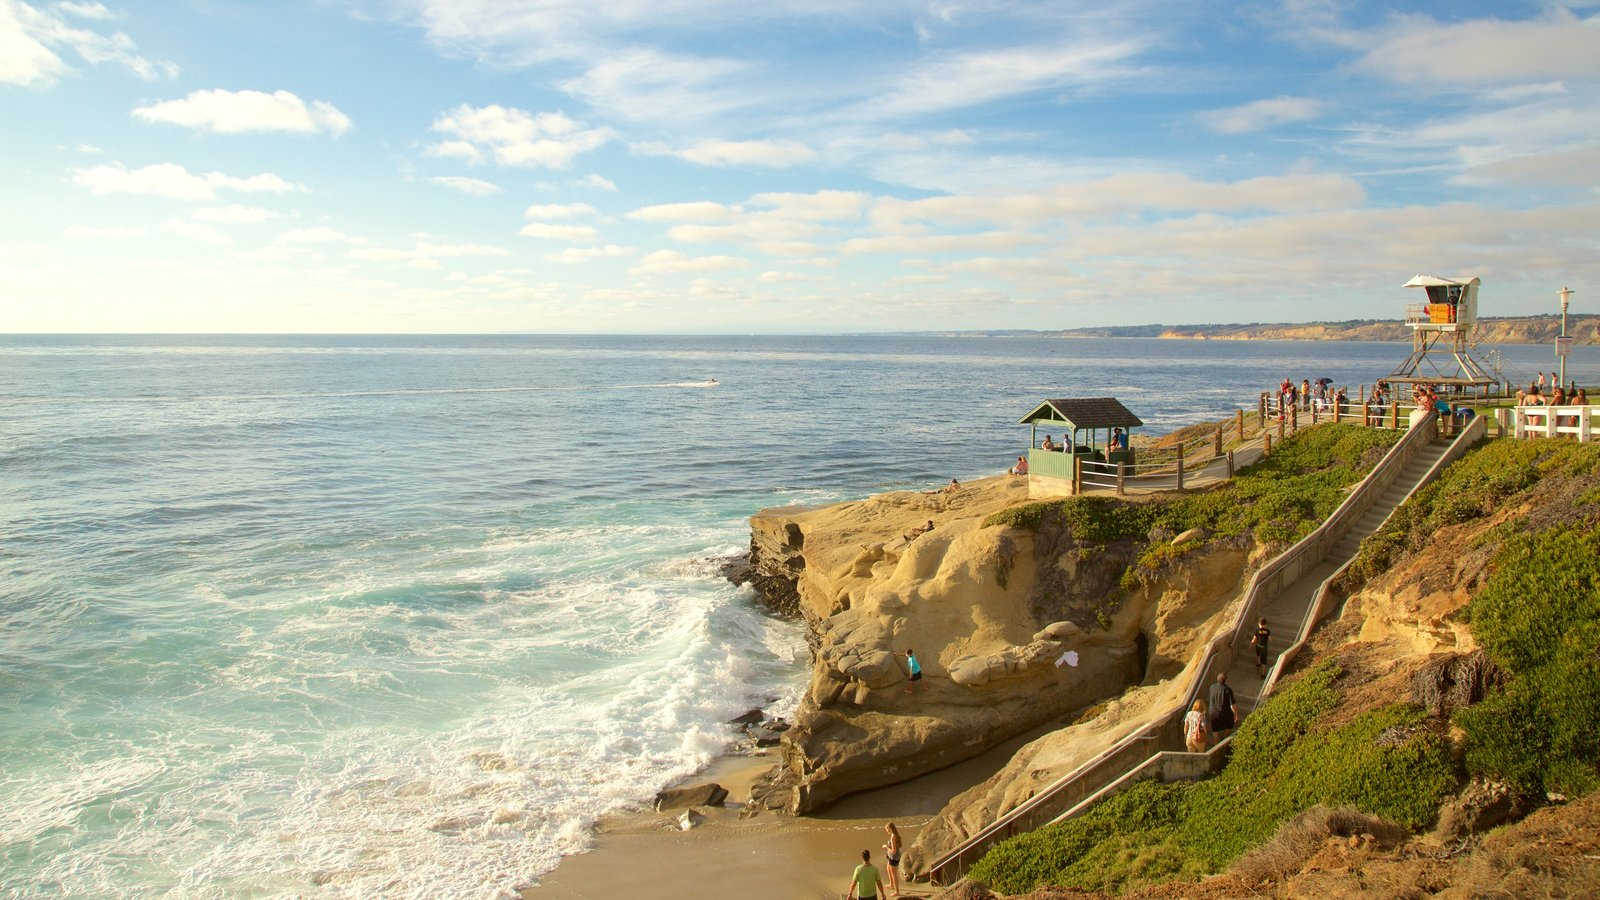 La Jolla caracterizando paisagens litorâneas, litoral rochoso e uma praia